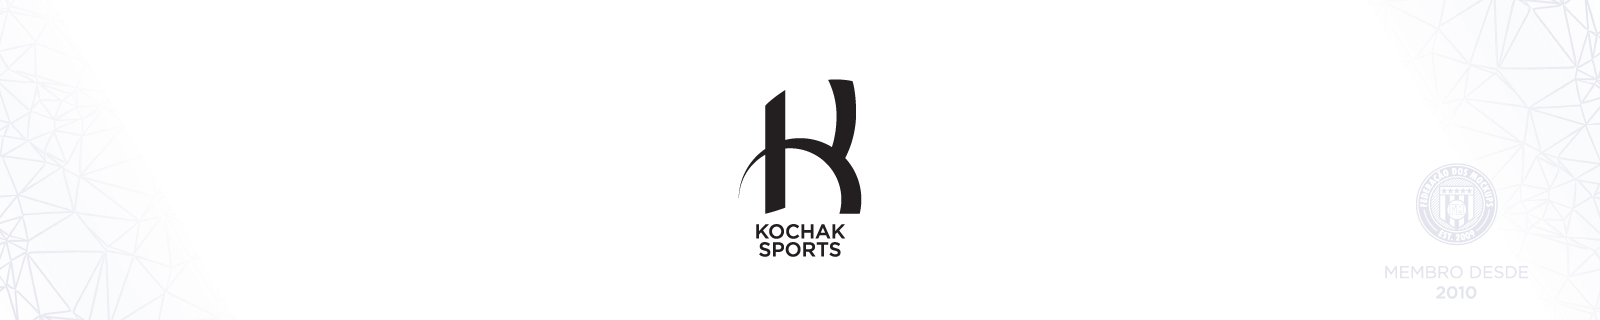 Kochak Sports